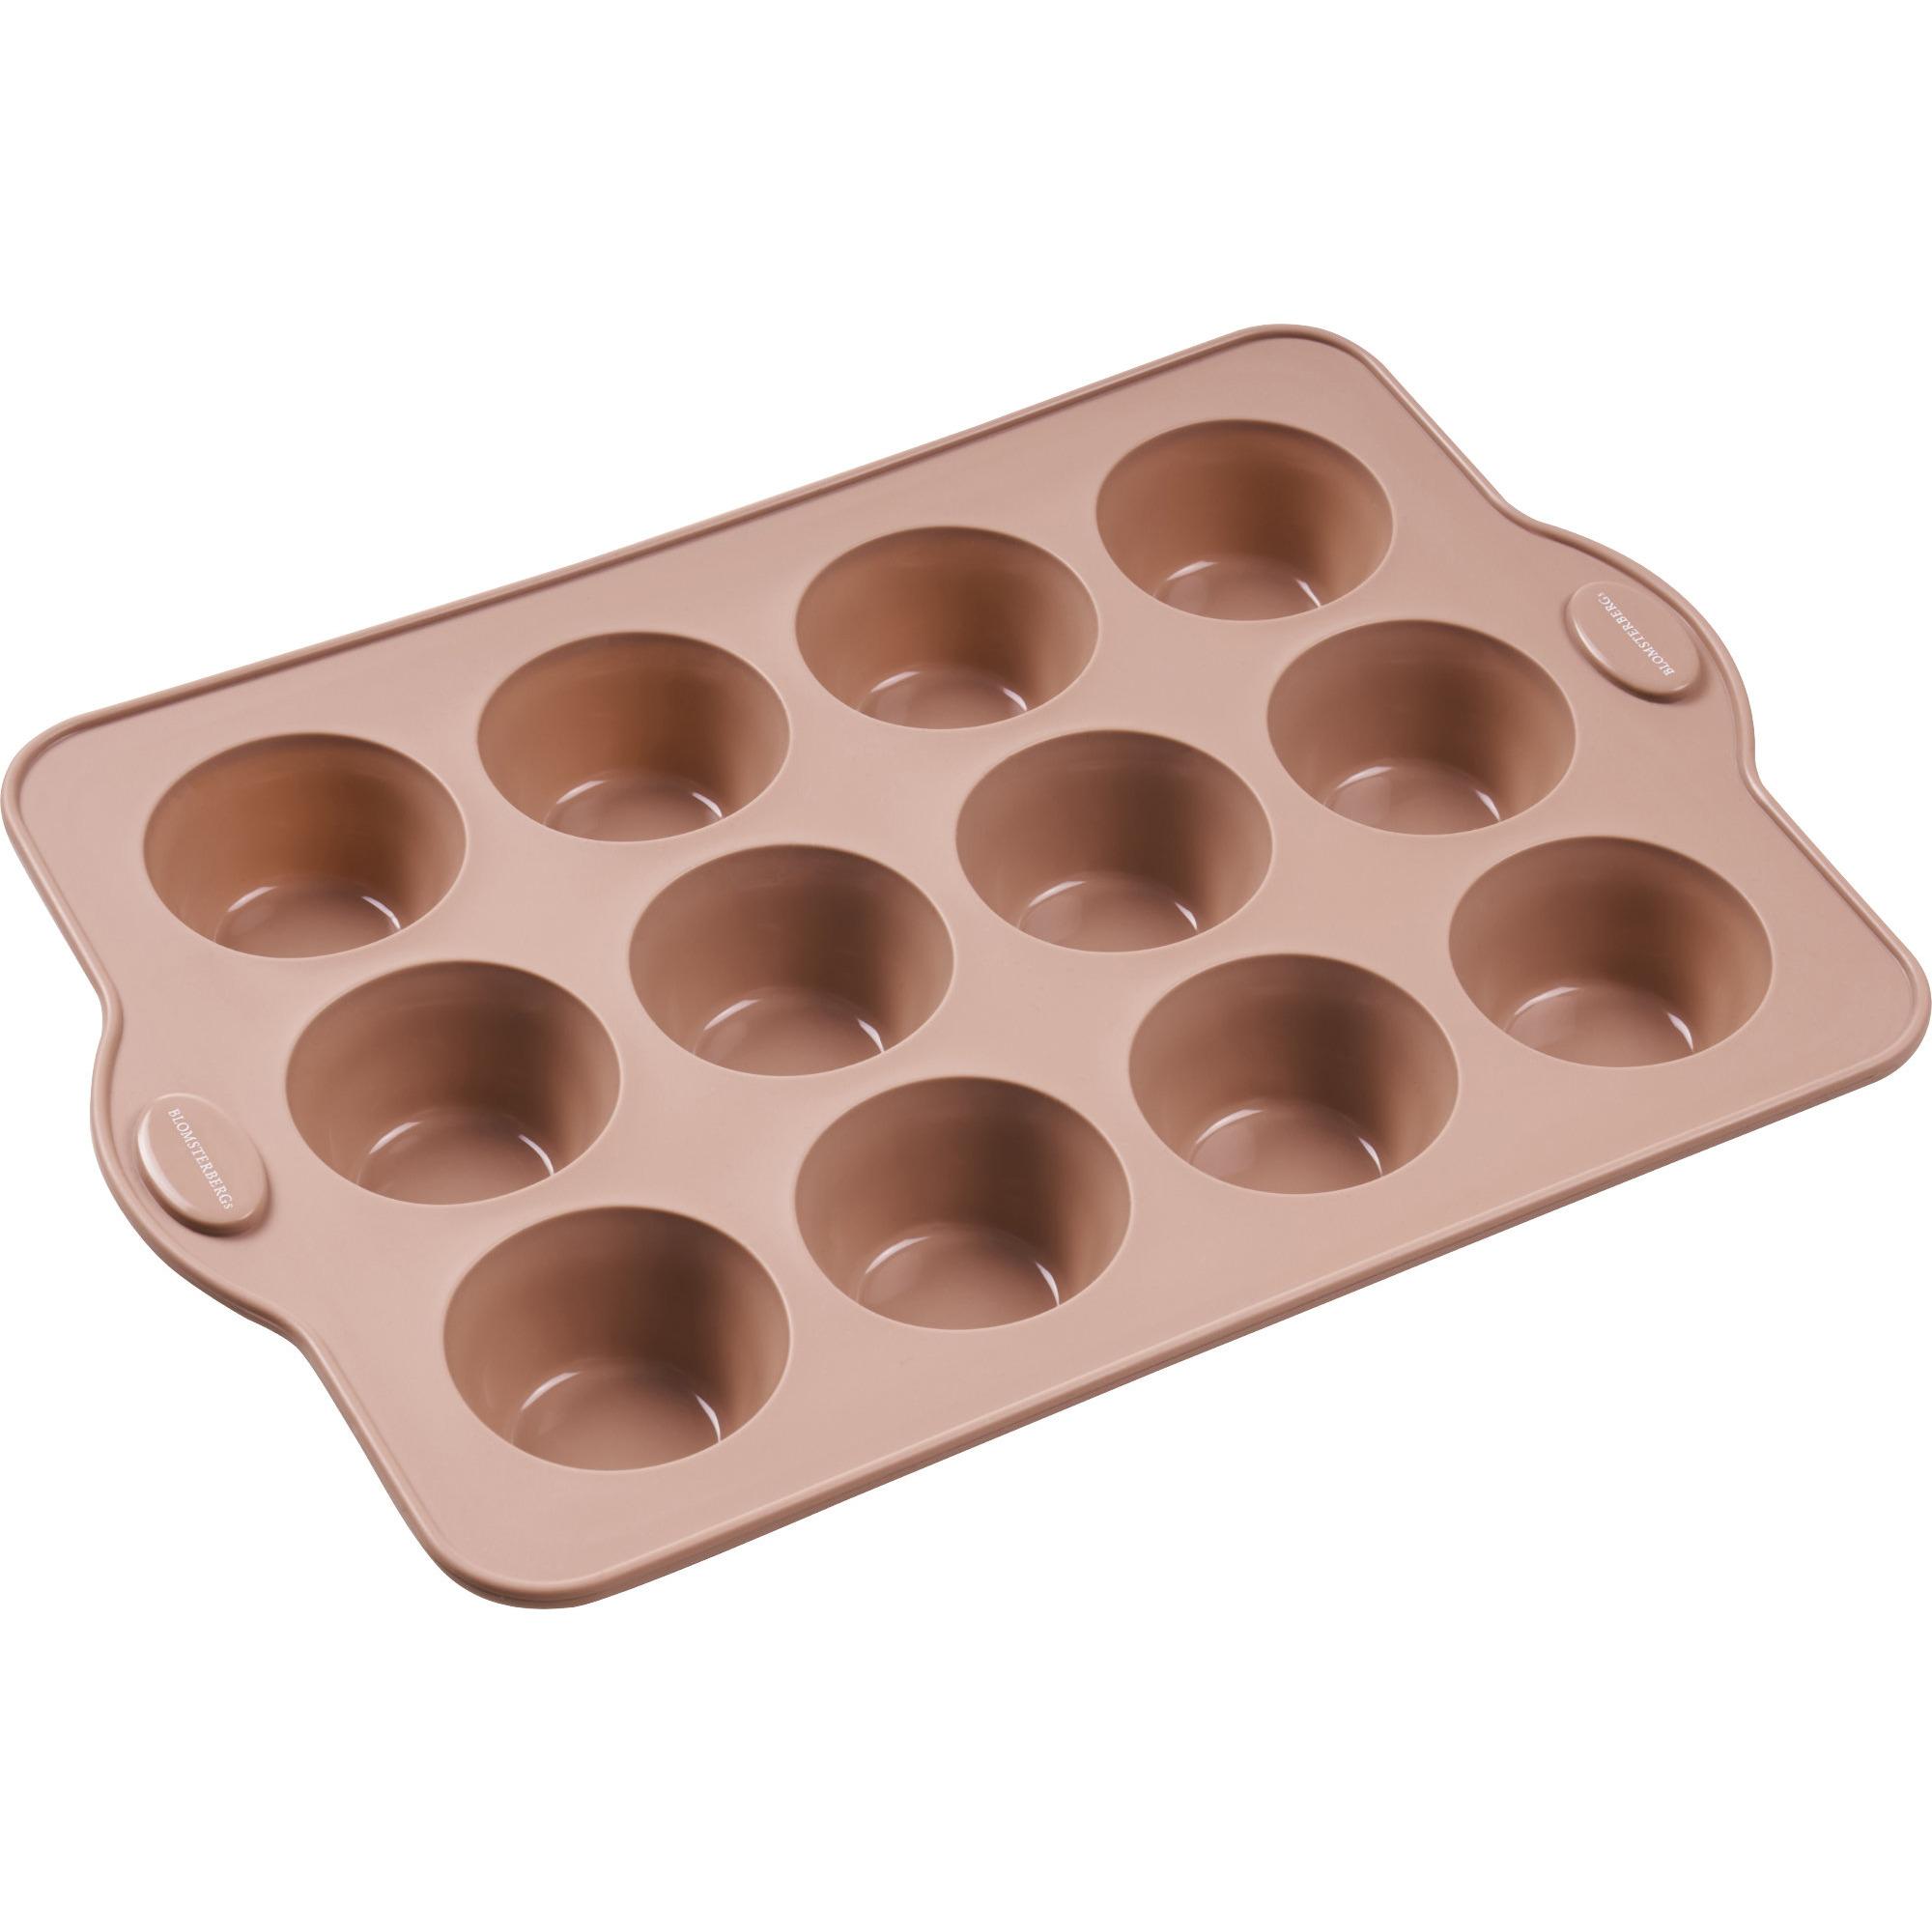 Blomsterbergs Muffinsform 12 st Rosa Silikon